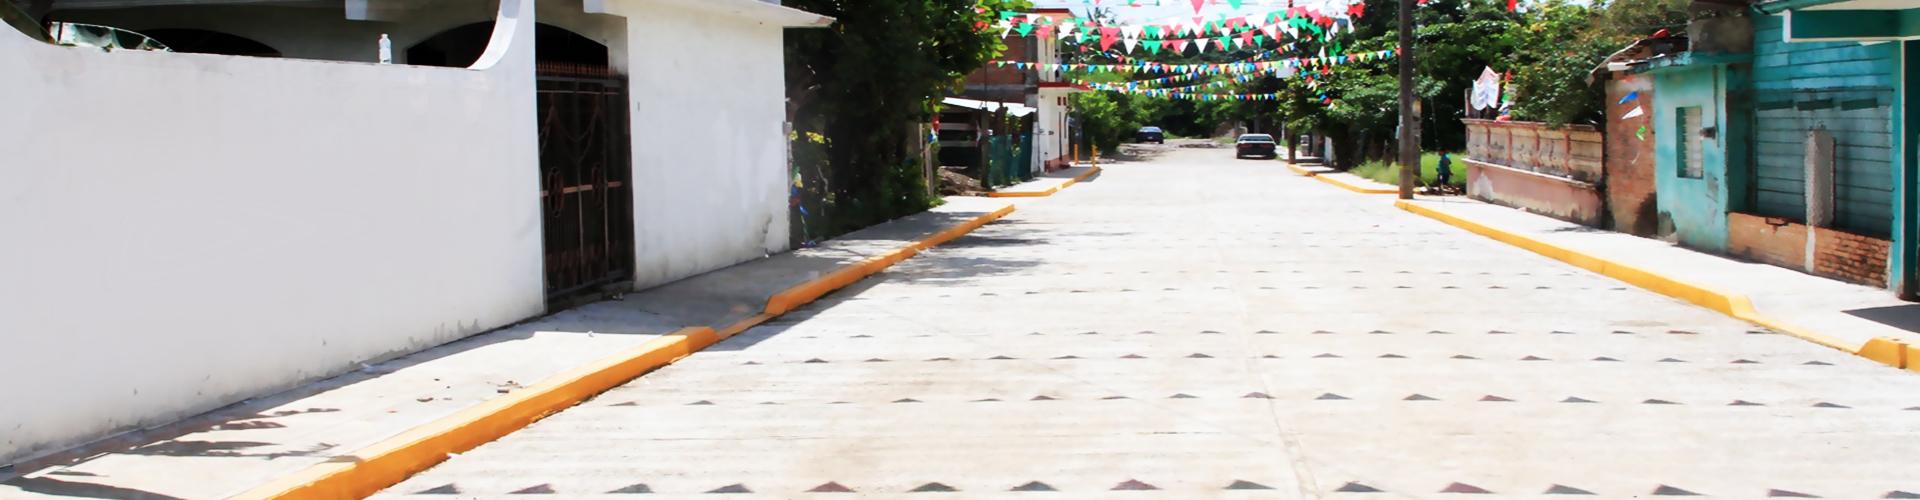 calle1